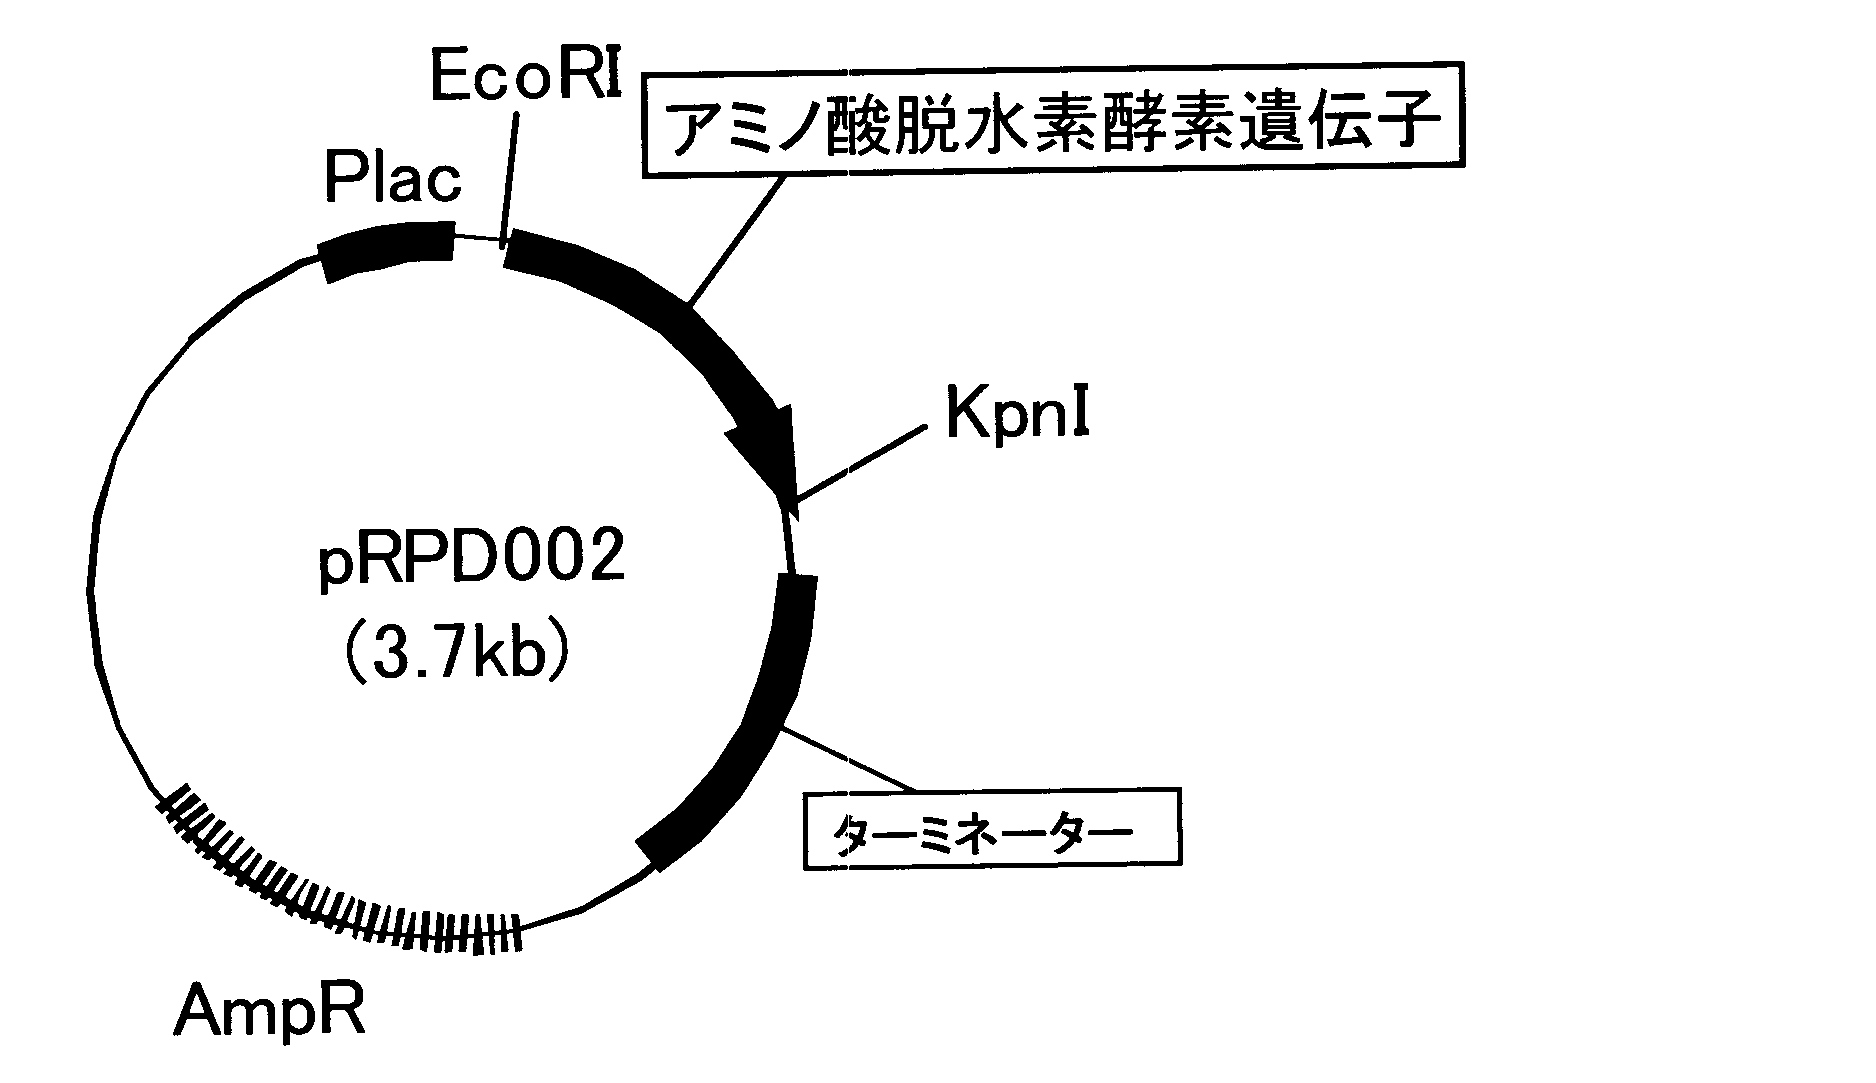 WO2010067578A1 - 新規なアミノ酸脱水素酵素、およびl-アミノ酸、2-オキソ酸、又はd-アミノ酸の製造方法          - Google PatentsFamily